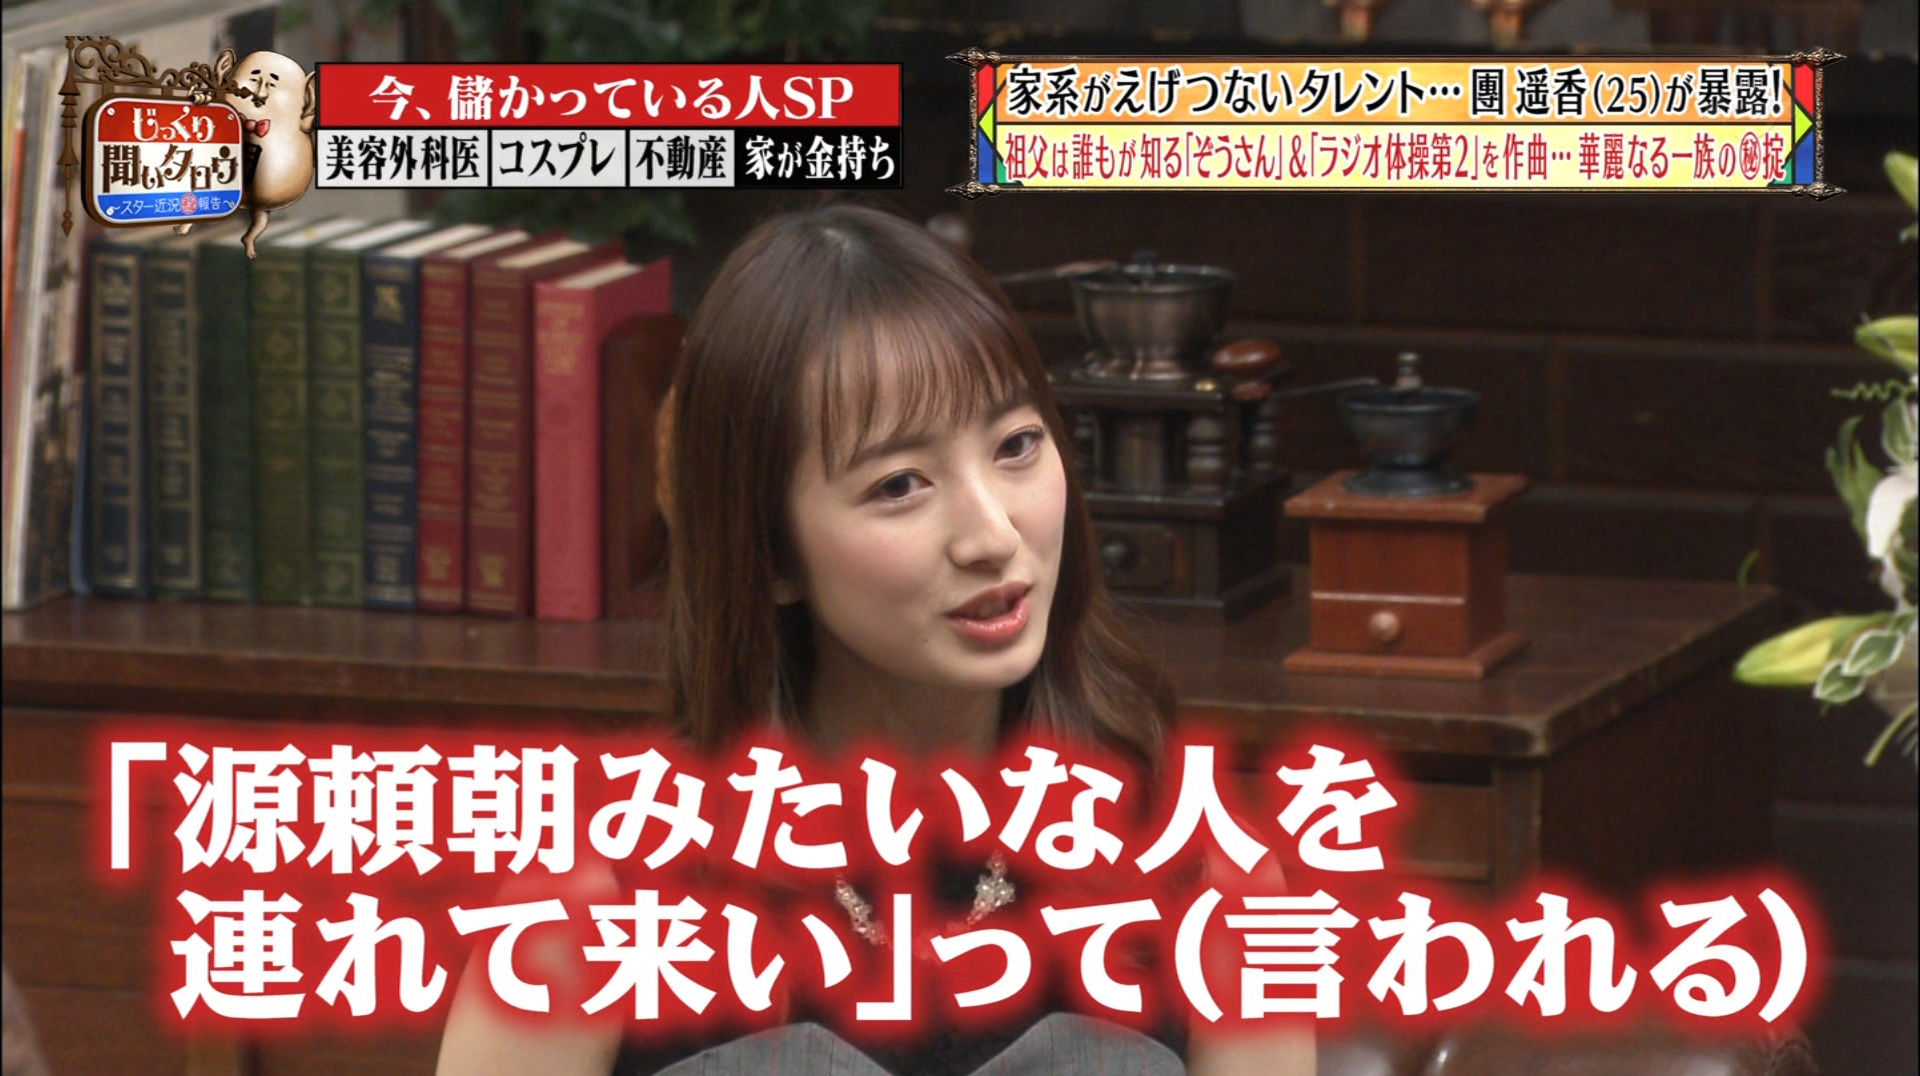 http://livedoor.blogimg.jp/joshiananews/imgs/d/b/db1845d0.jpg